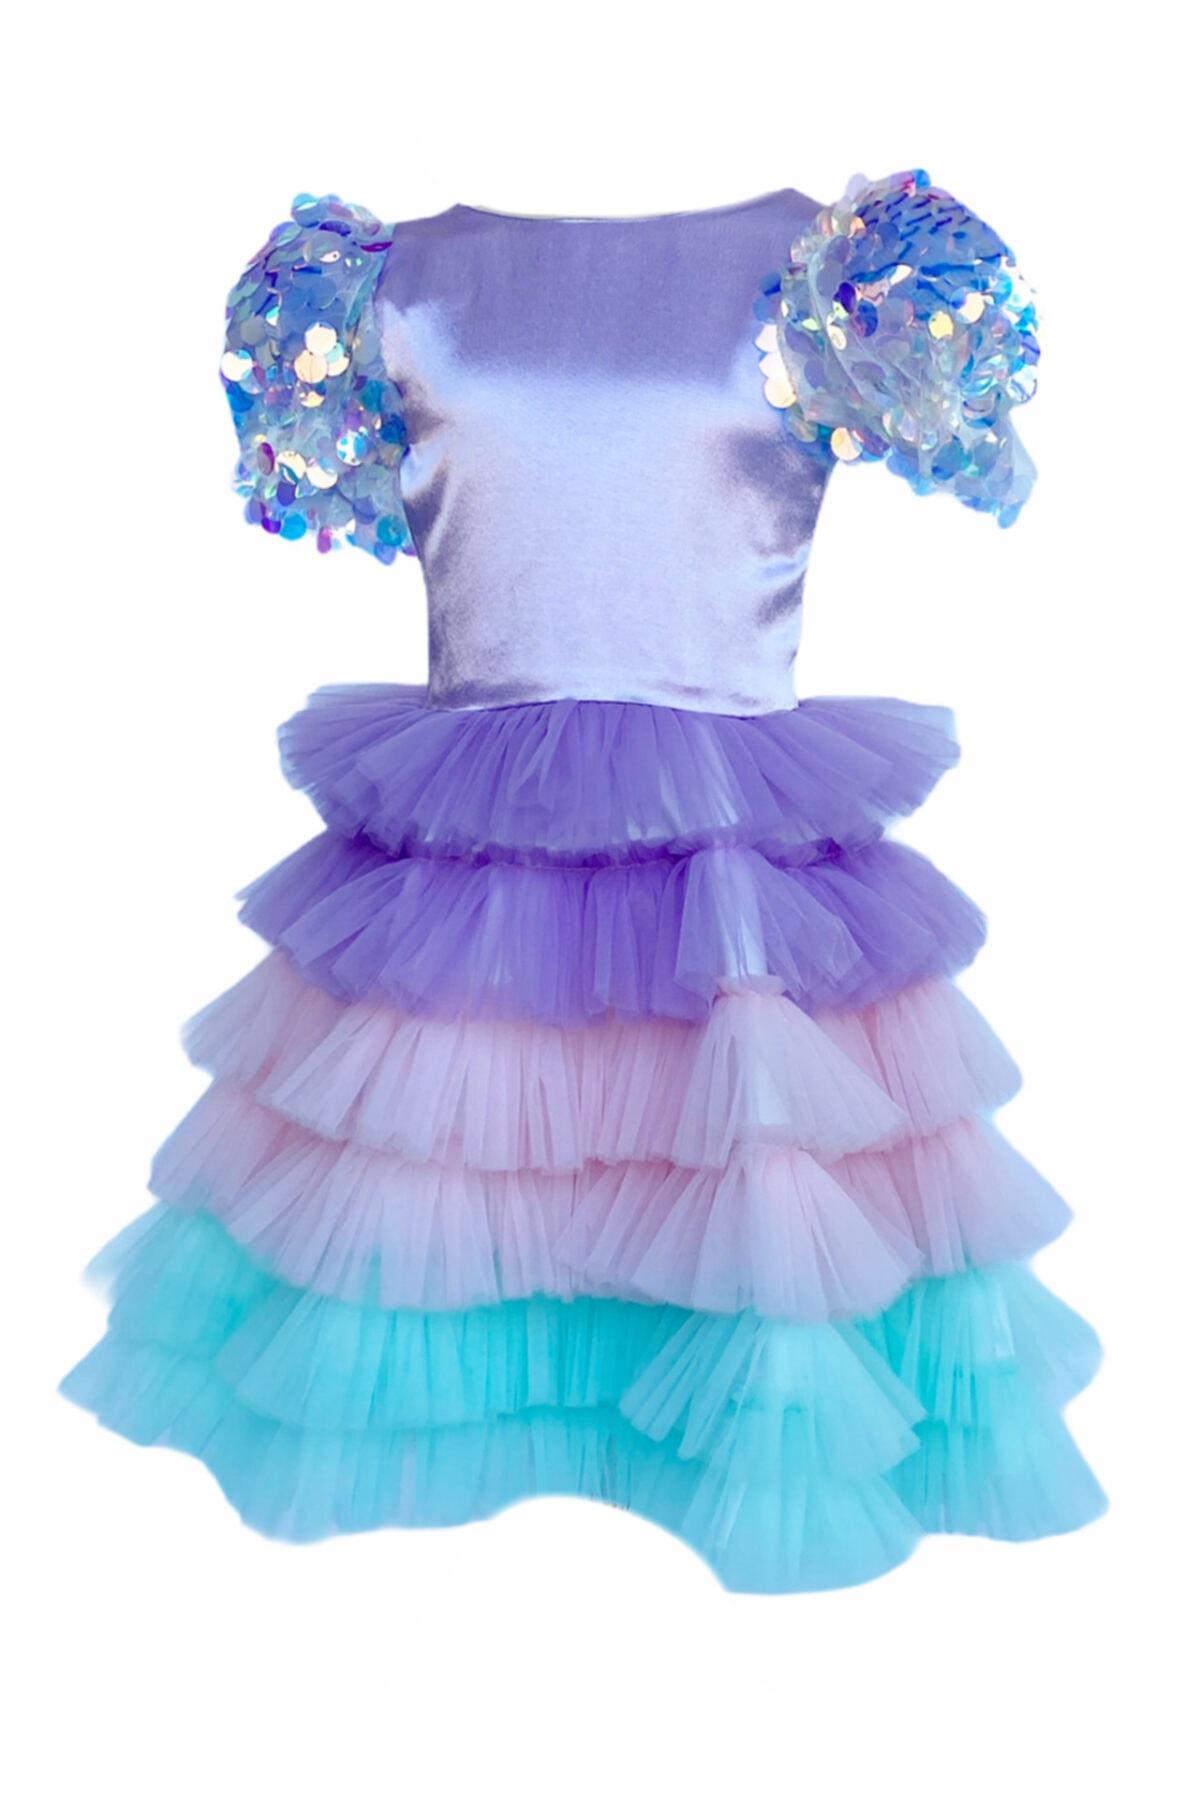 لباس مجلسی دخترانه 2021 برند zühre balaban رنگ بنفش کد ty63170950